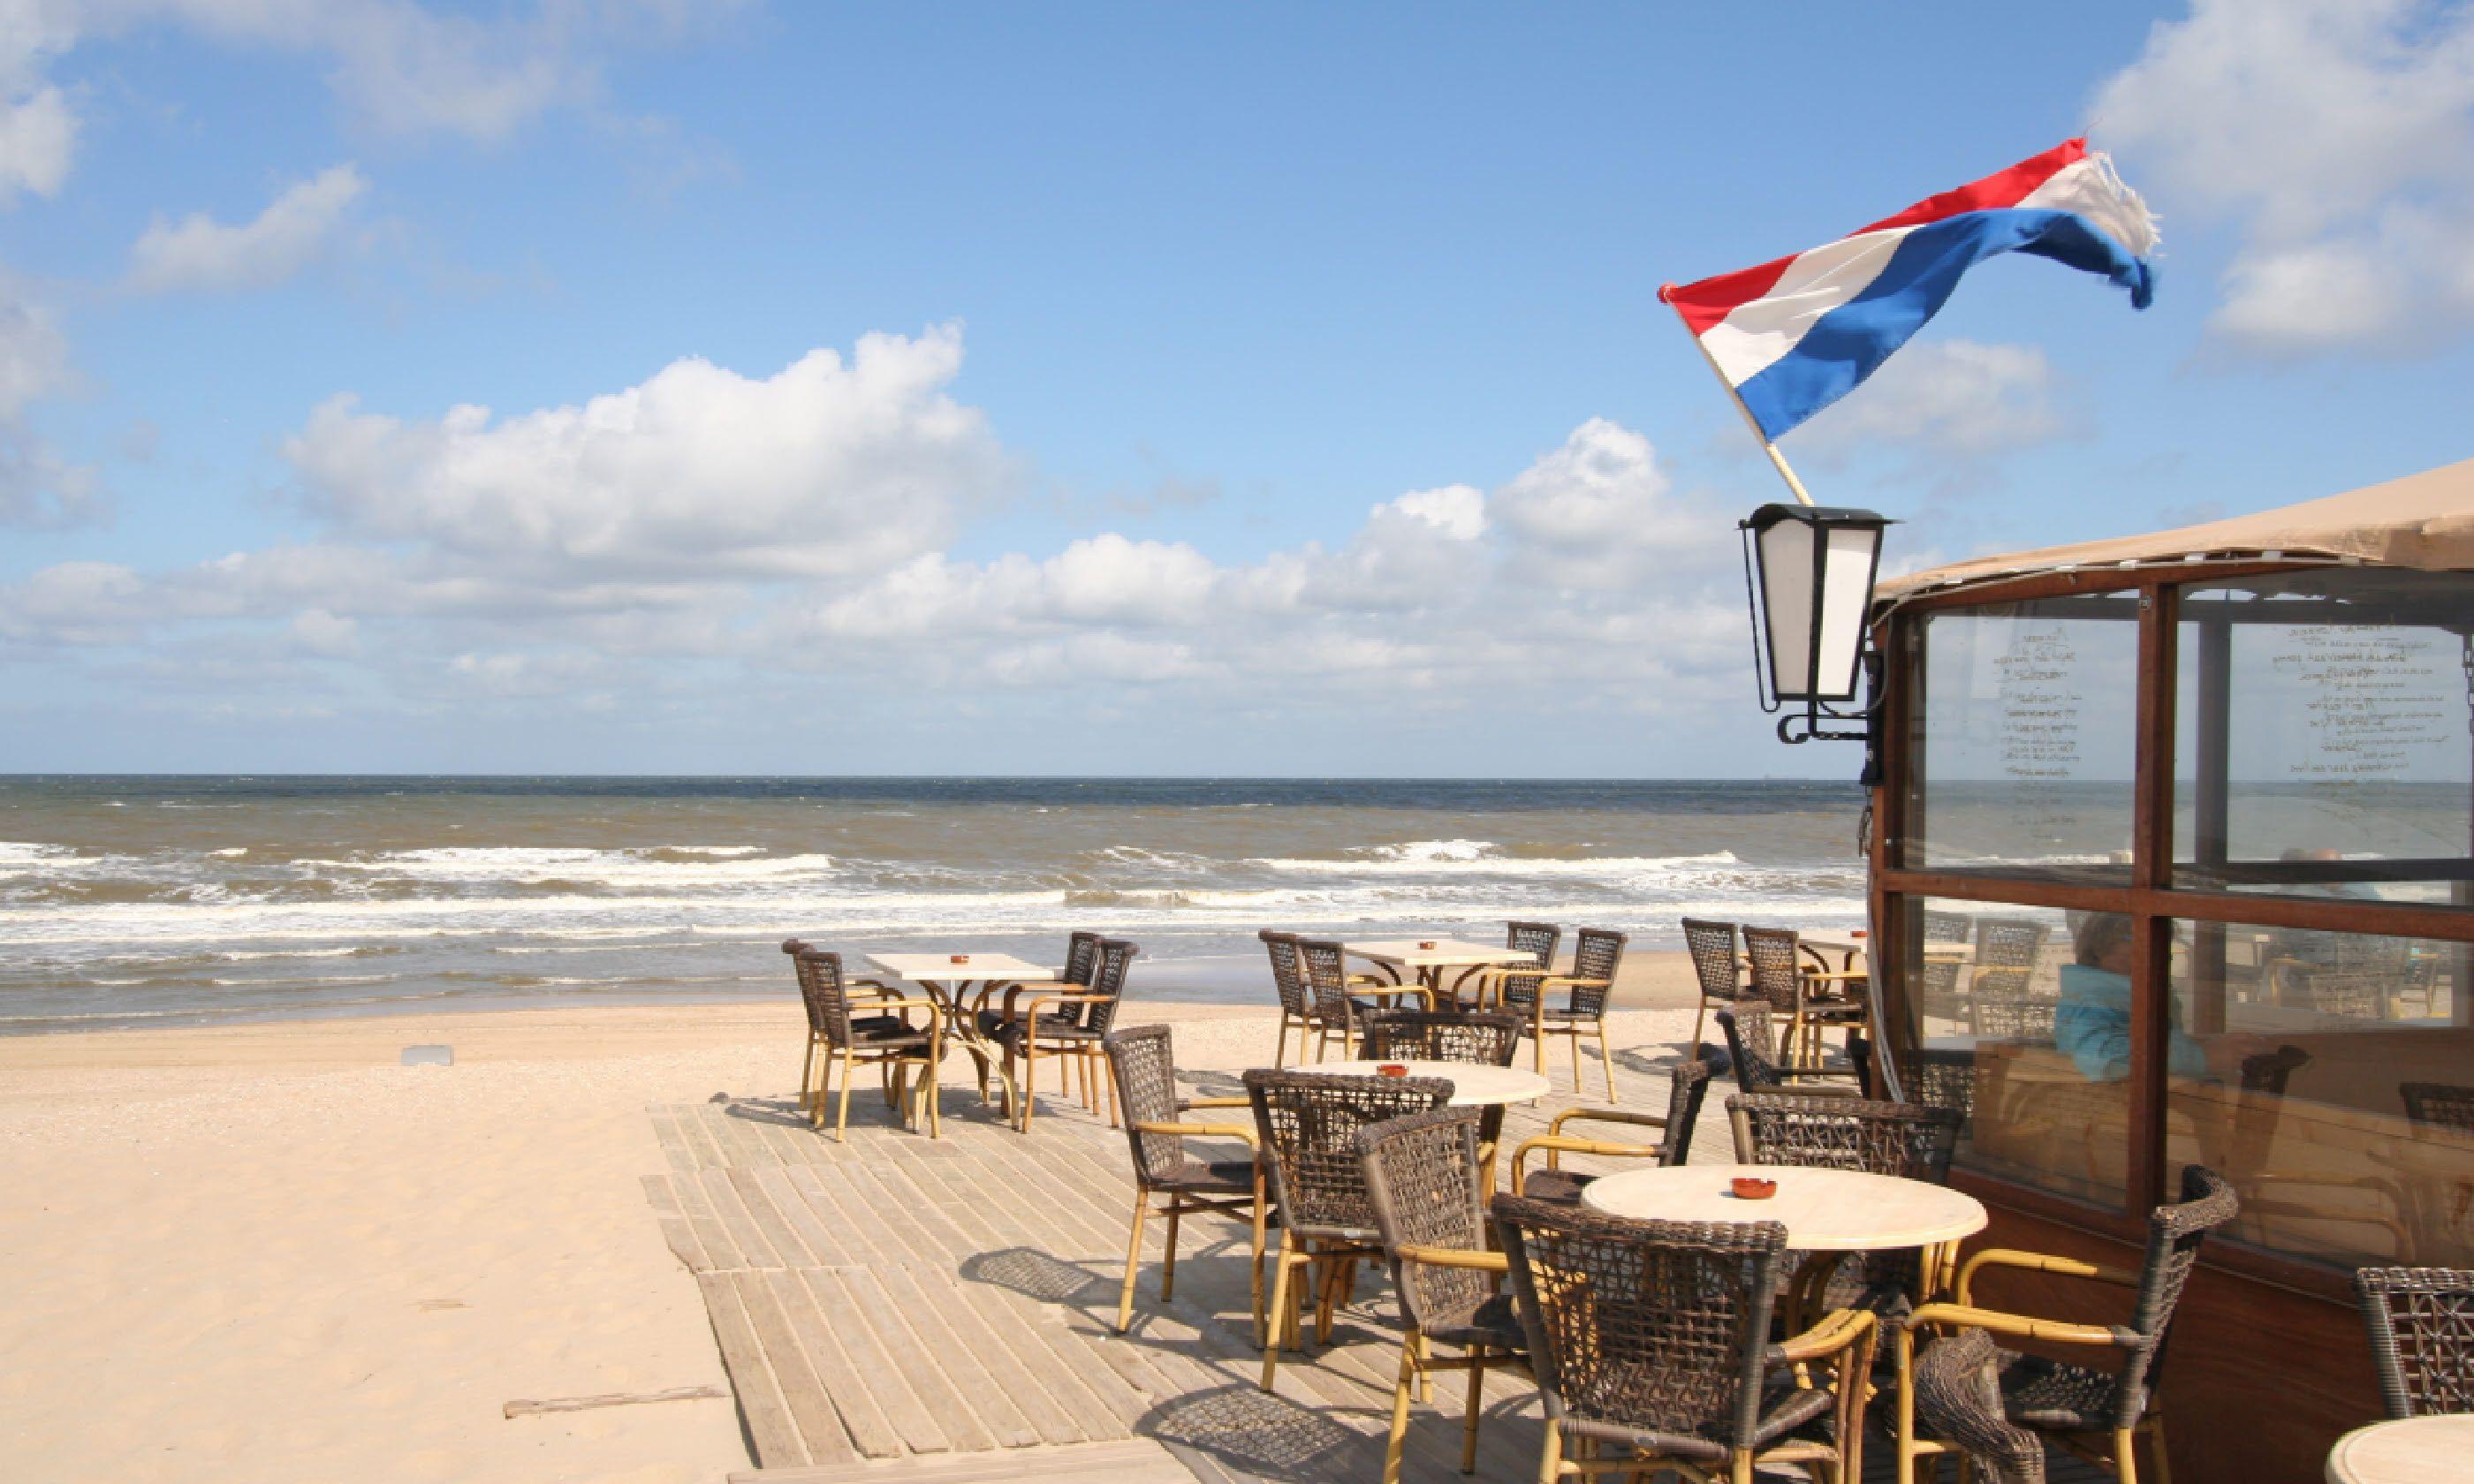 Beach restaurant with Dutch flag on the Dutch coast (Shutterstock)